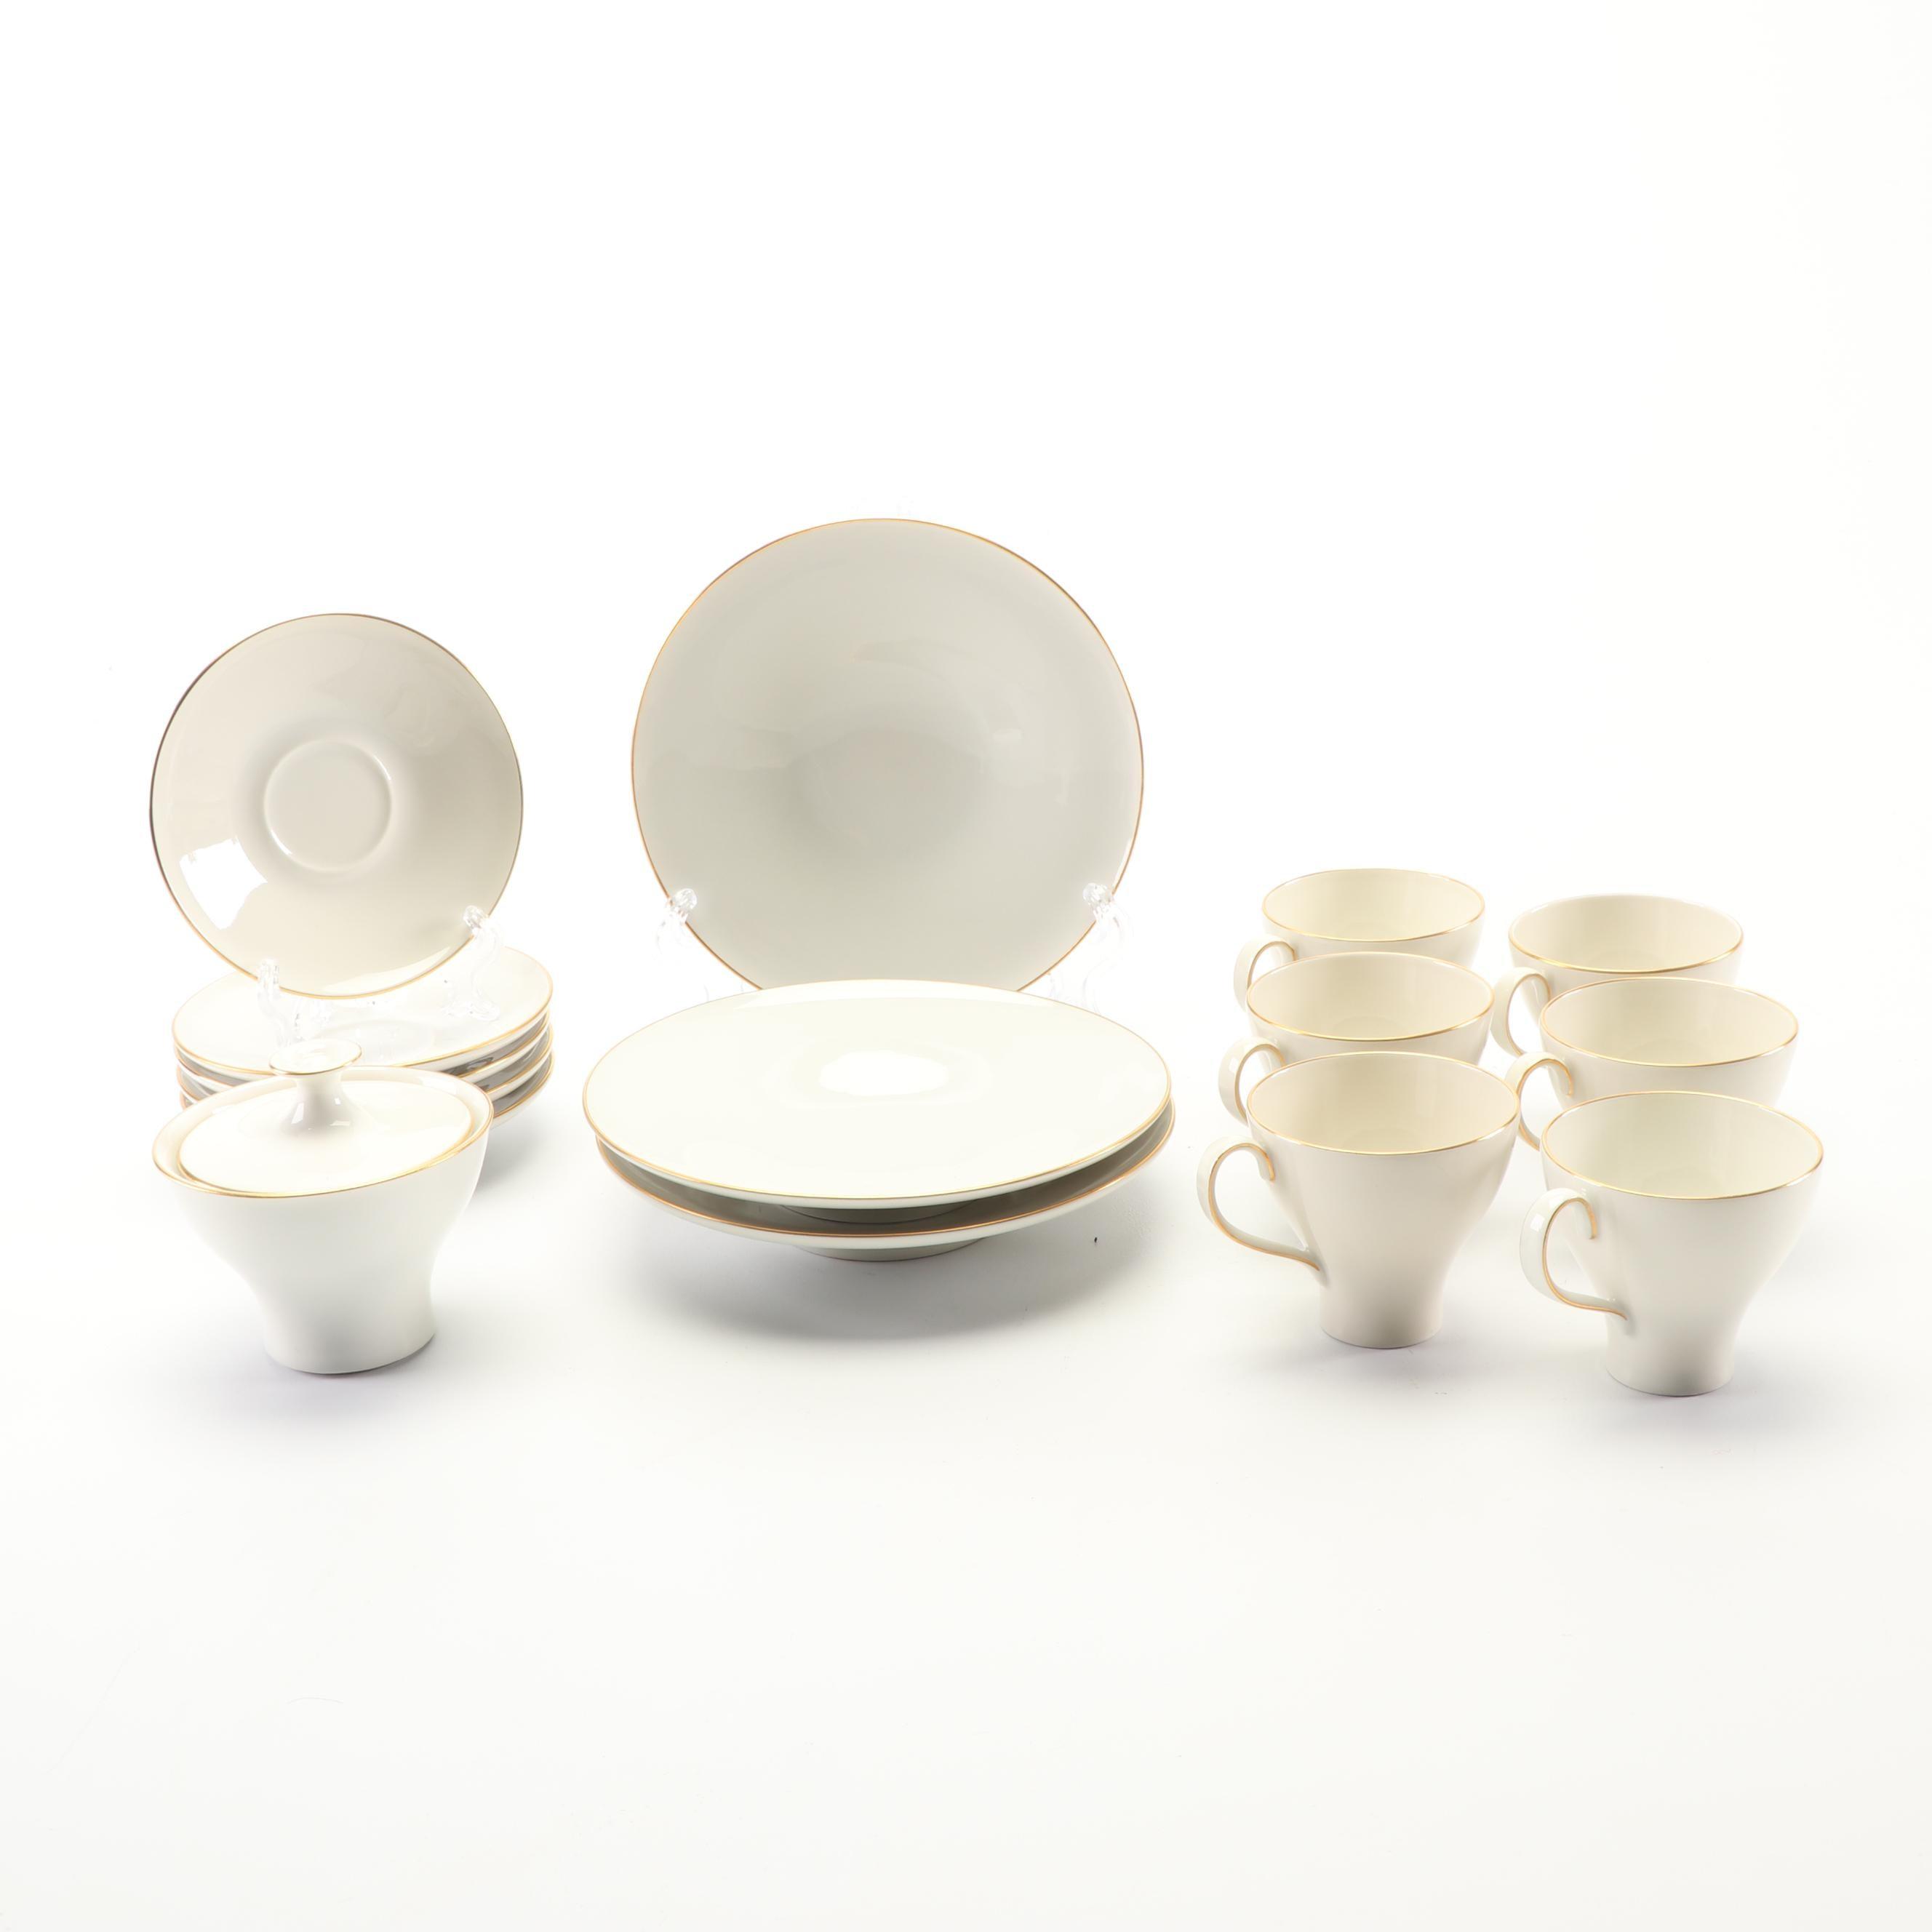 Vintage Konigliche Porzellan Manufacktur Porcelain Tea Set